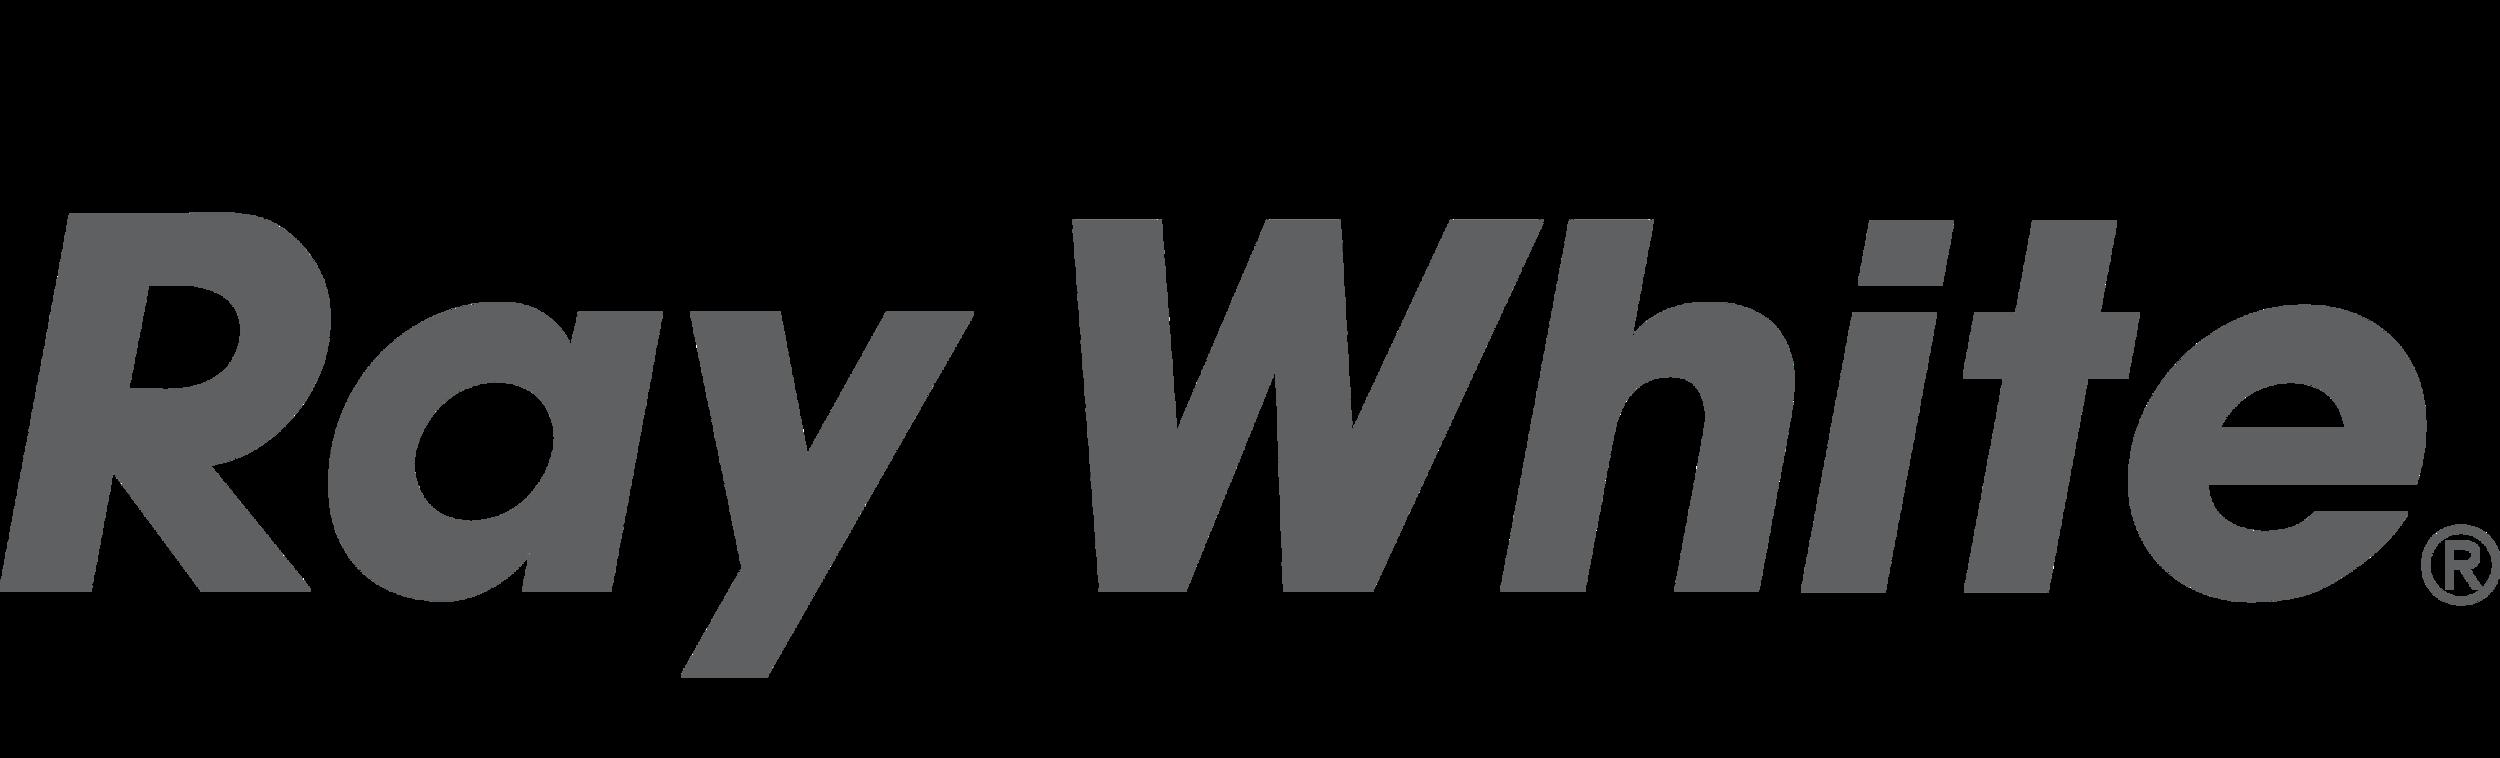 Ray-White-Logo-20121.png